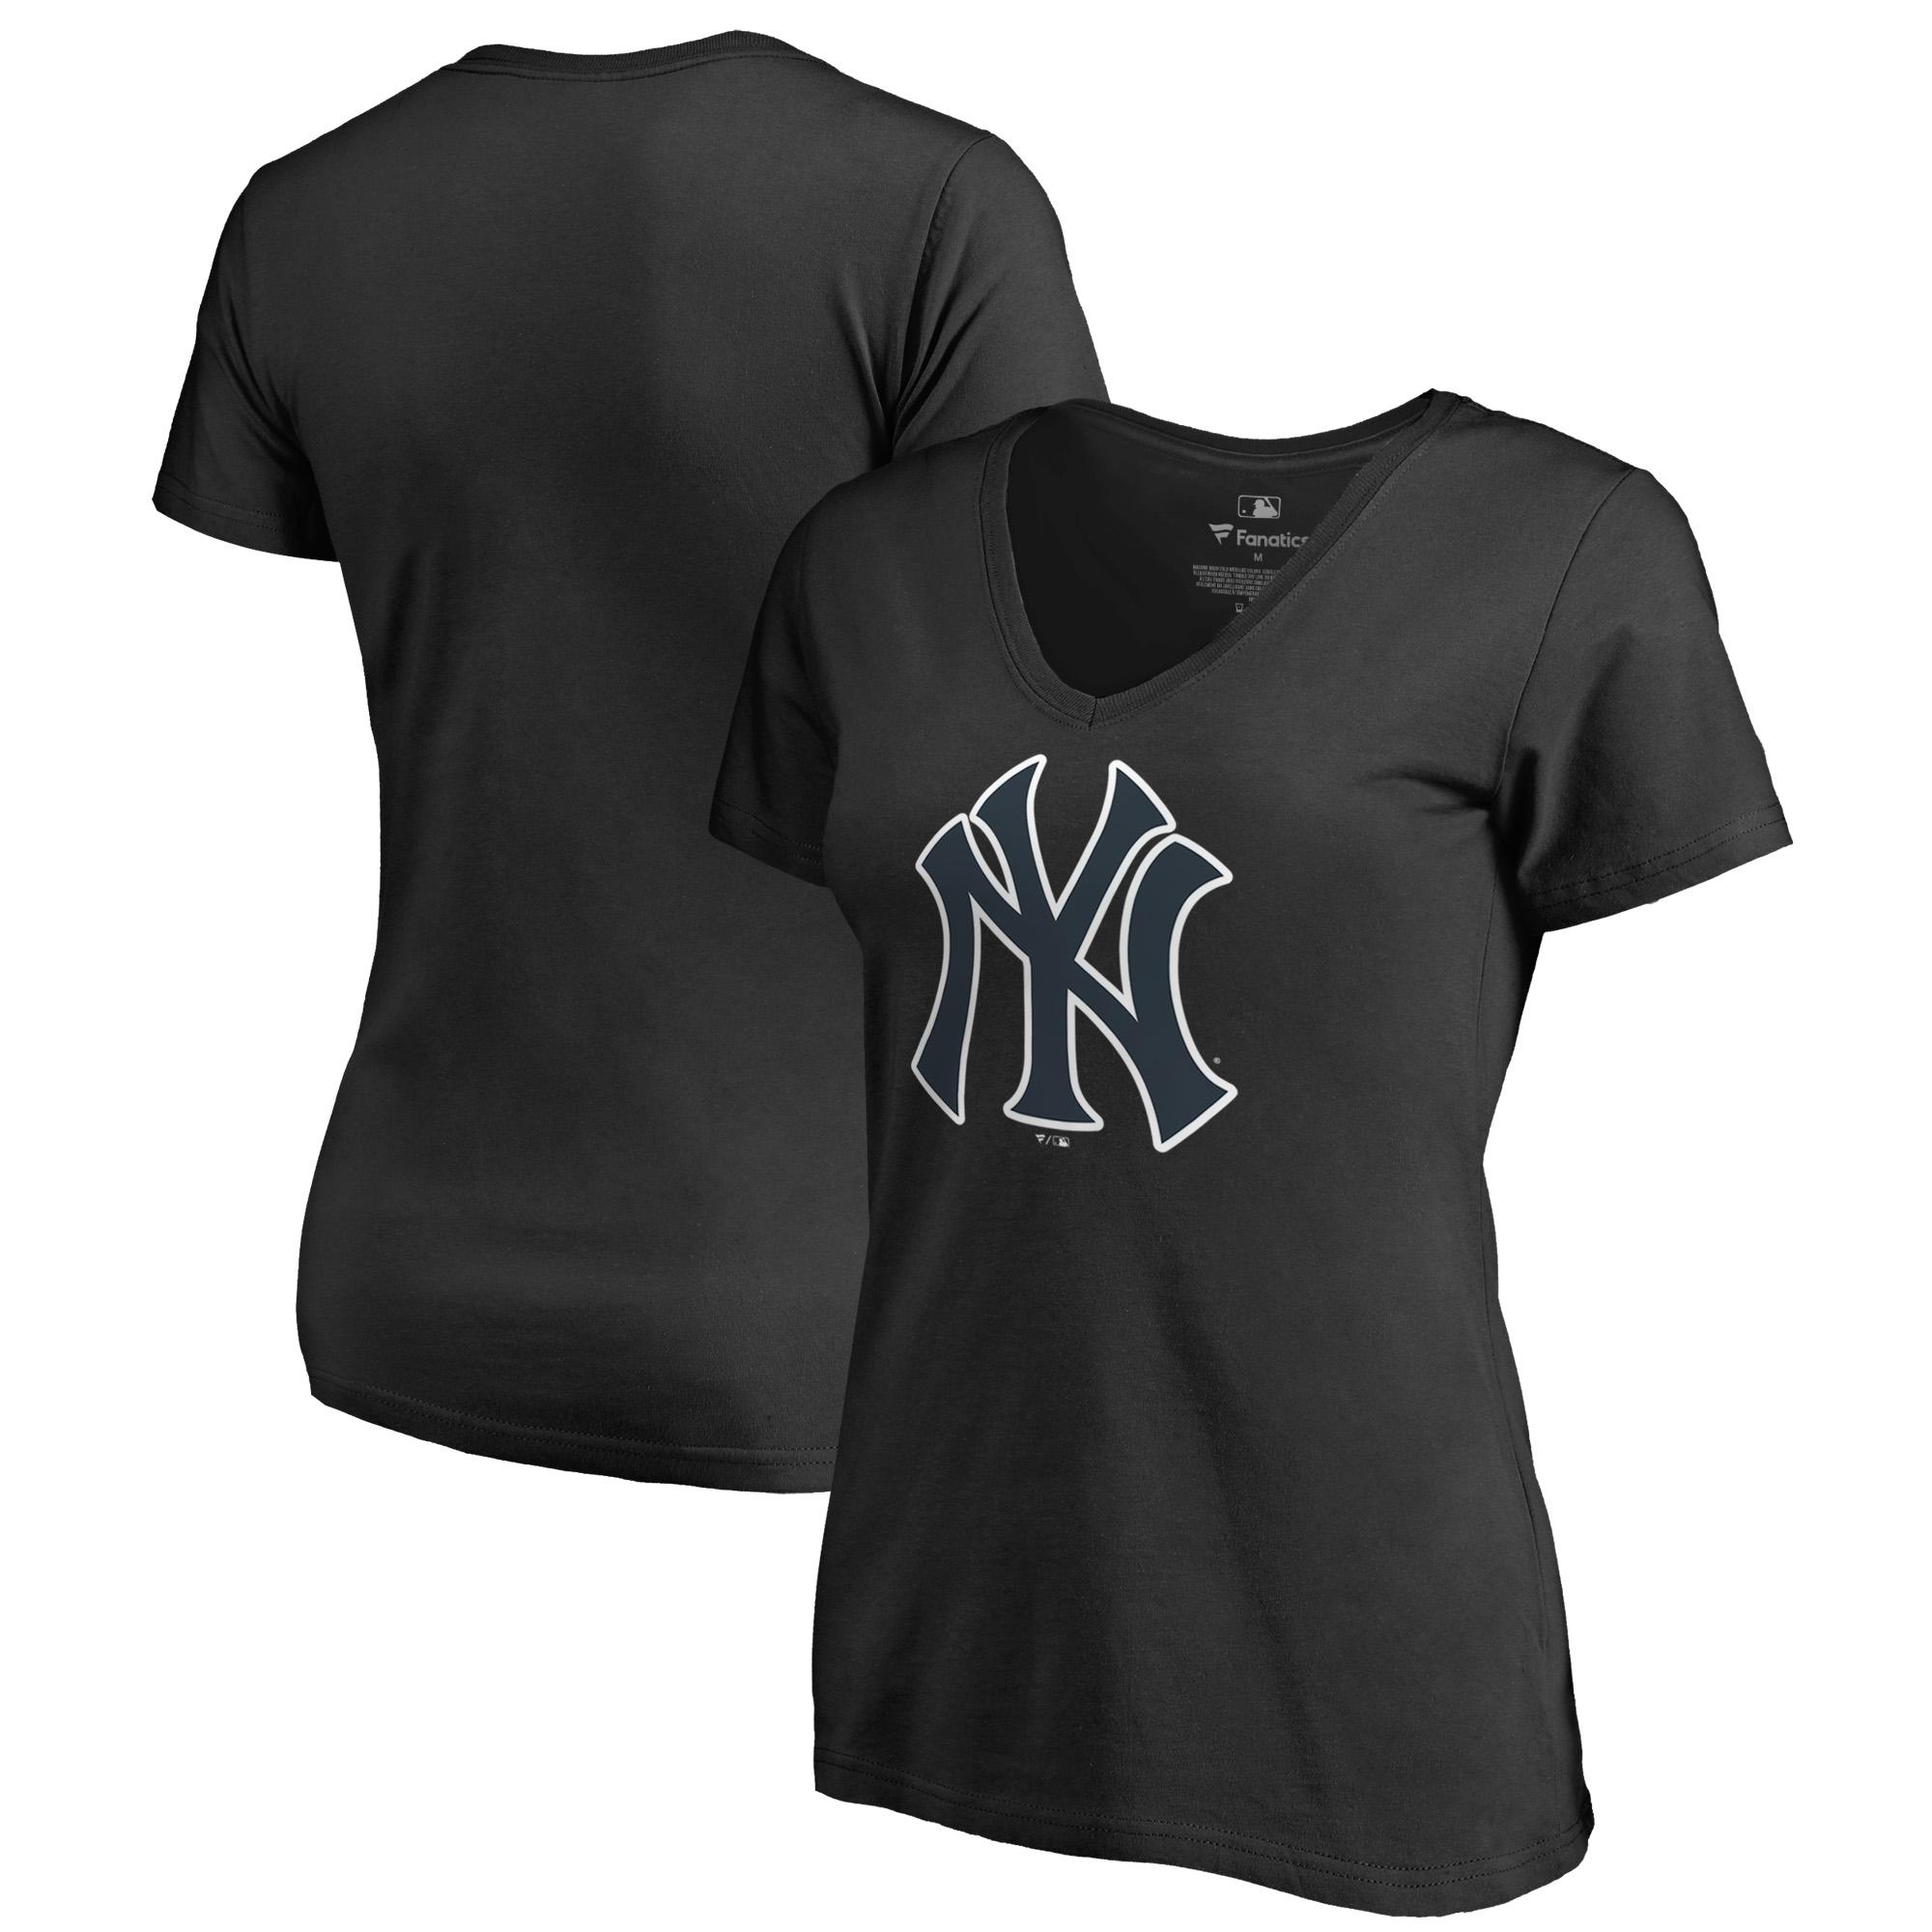 New York Yankees Fanatics Branded Women's Taylor Plus Size V-Neck T-Shirt - Black